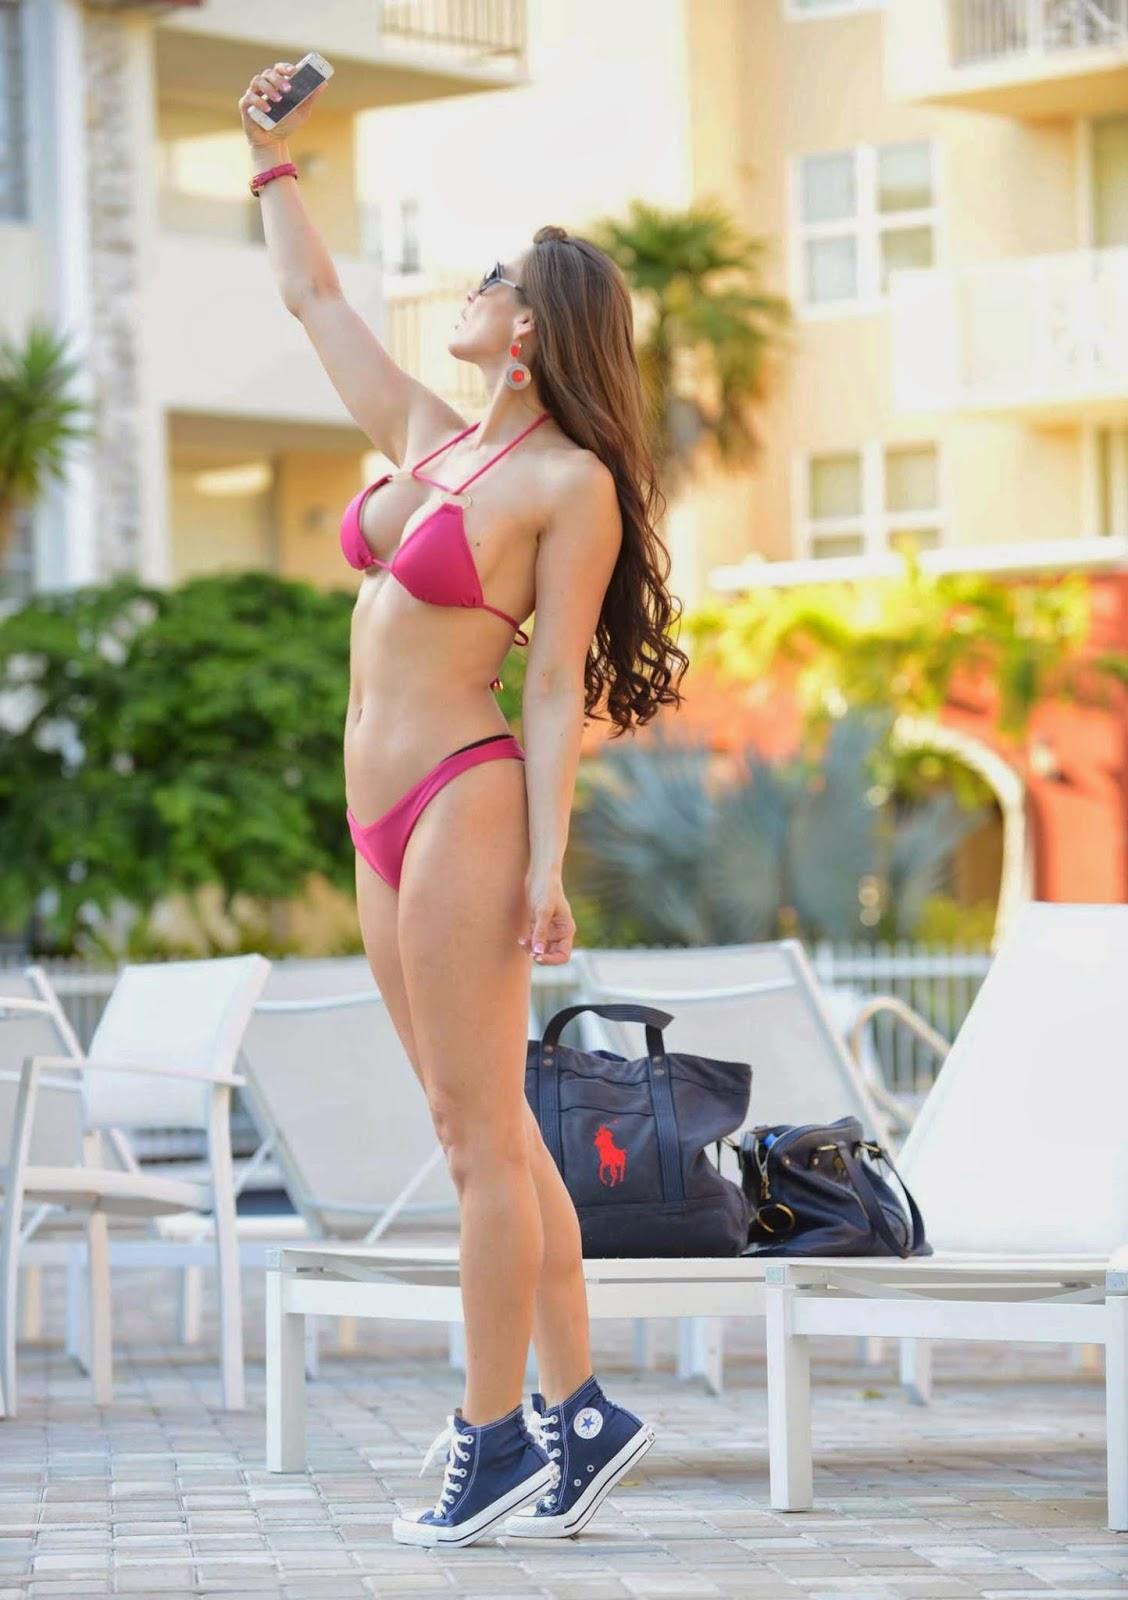 Anais Zanotti shows off her Red Bikini shapes at Miami on Saturday, March 22, 2014